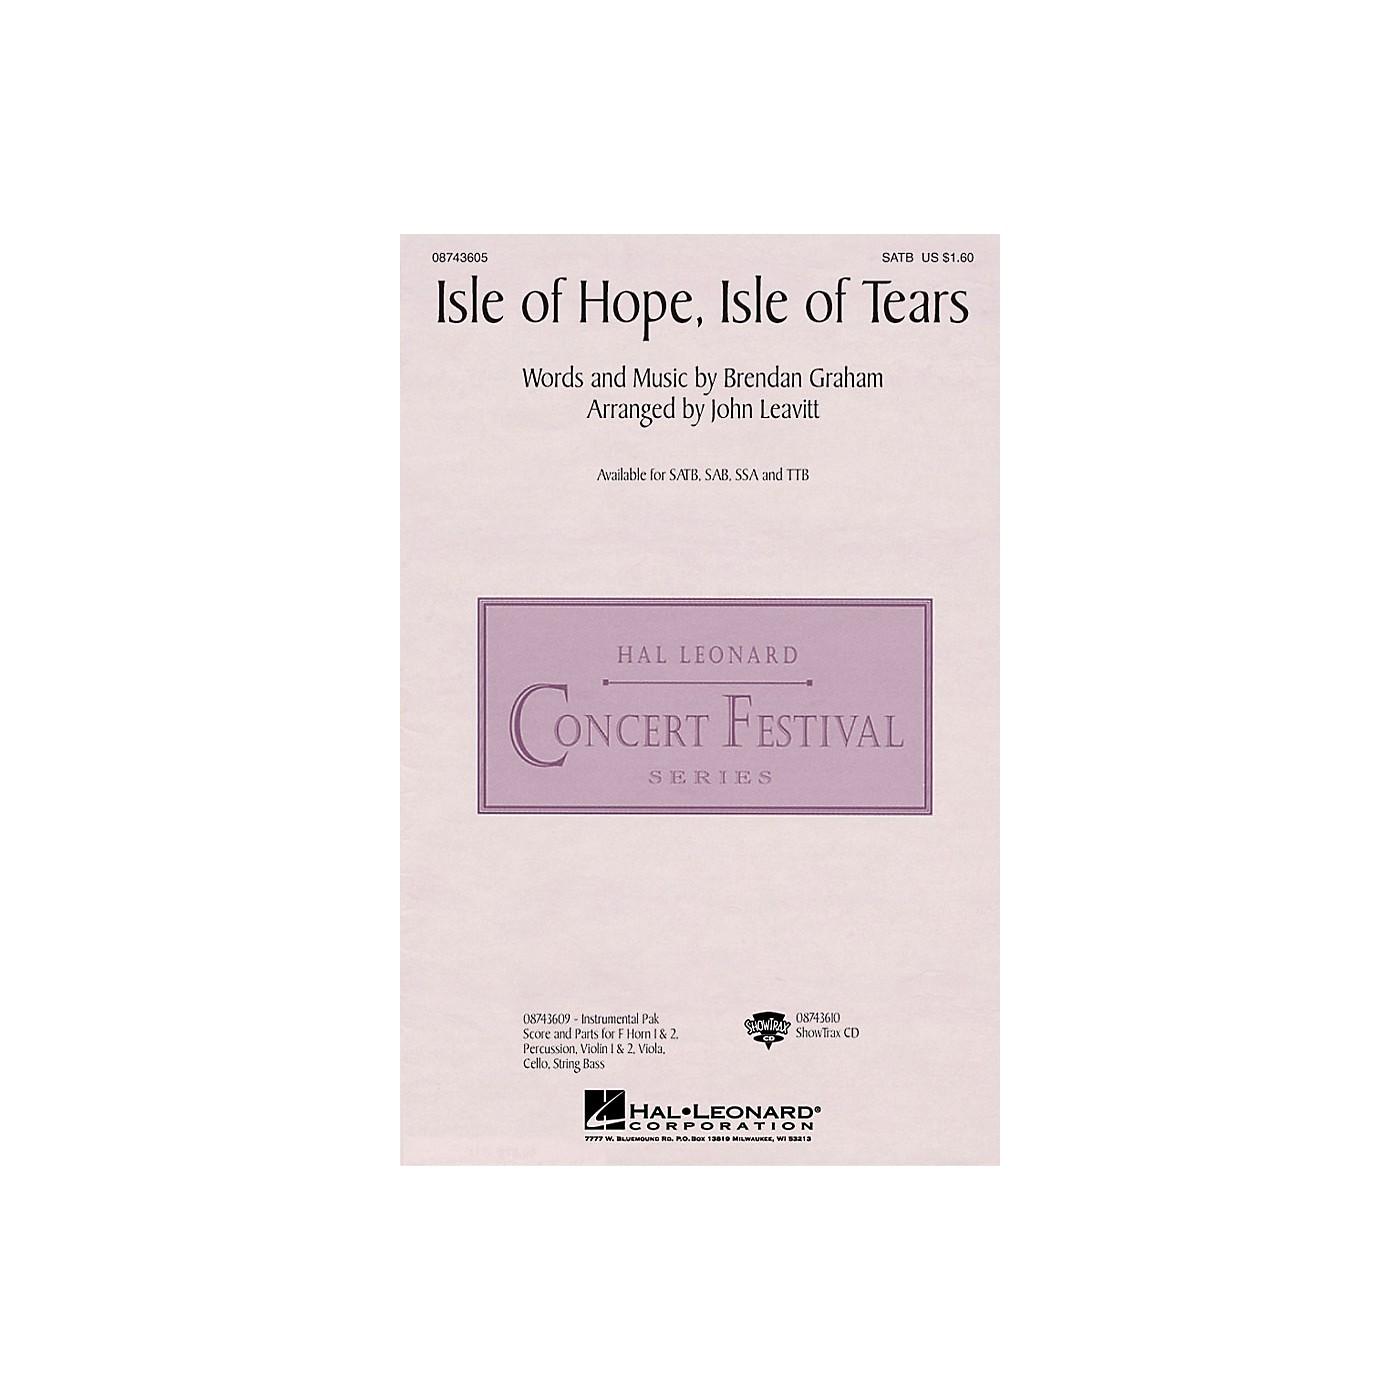 Hal Leonard Isle of Hope, Isle of Tears ShowTrax CD by The Irish Tenors Arranged by John Leavitt thumbnail